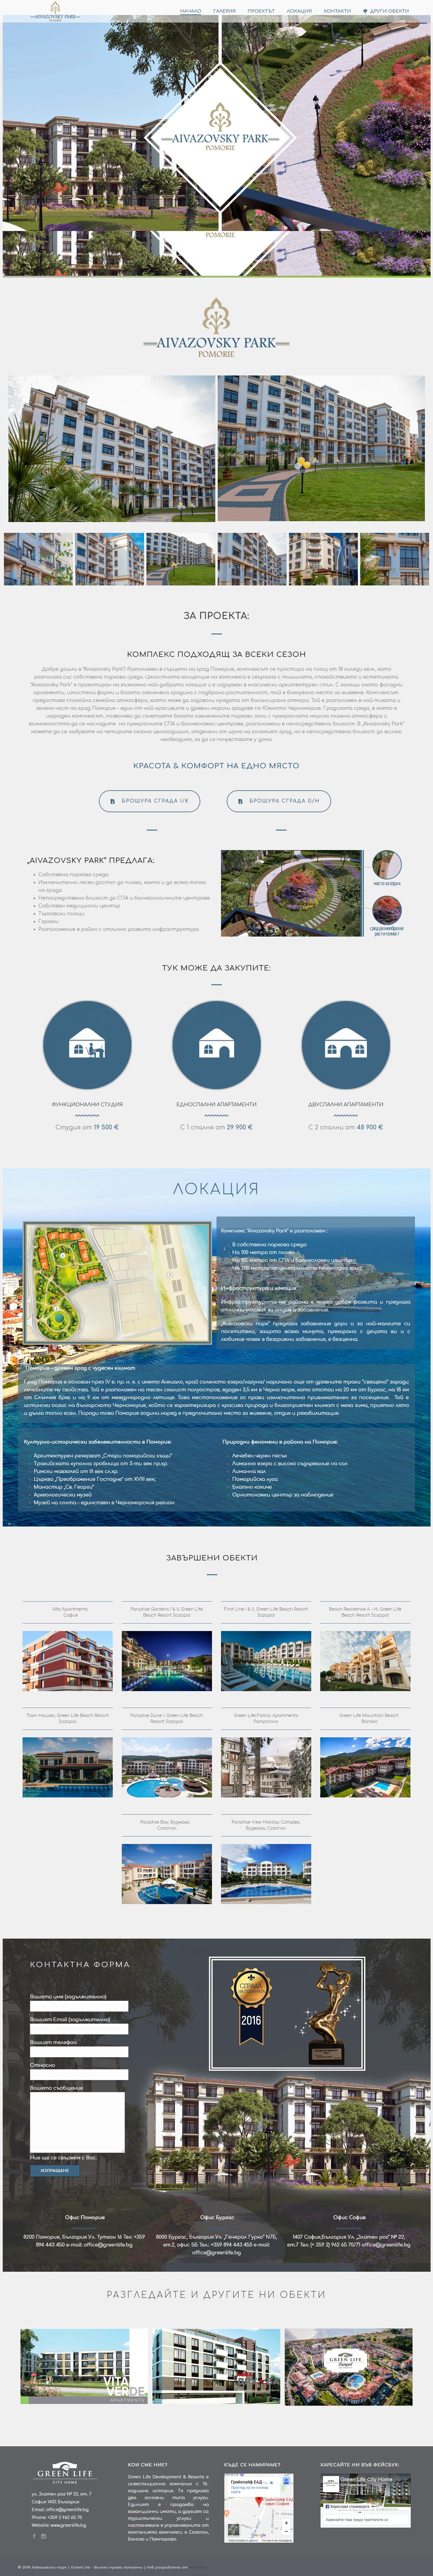 Web sajt za Aivazovsky park